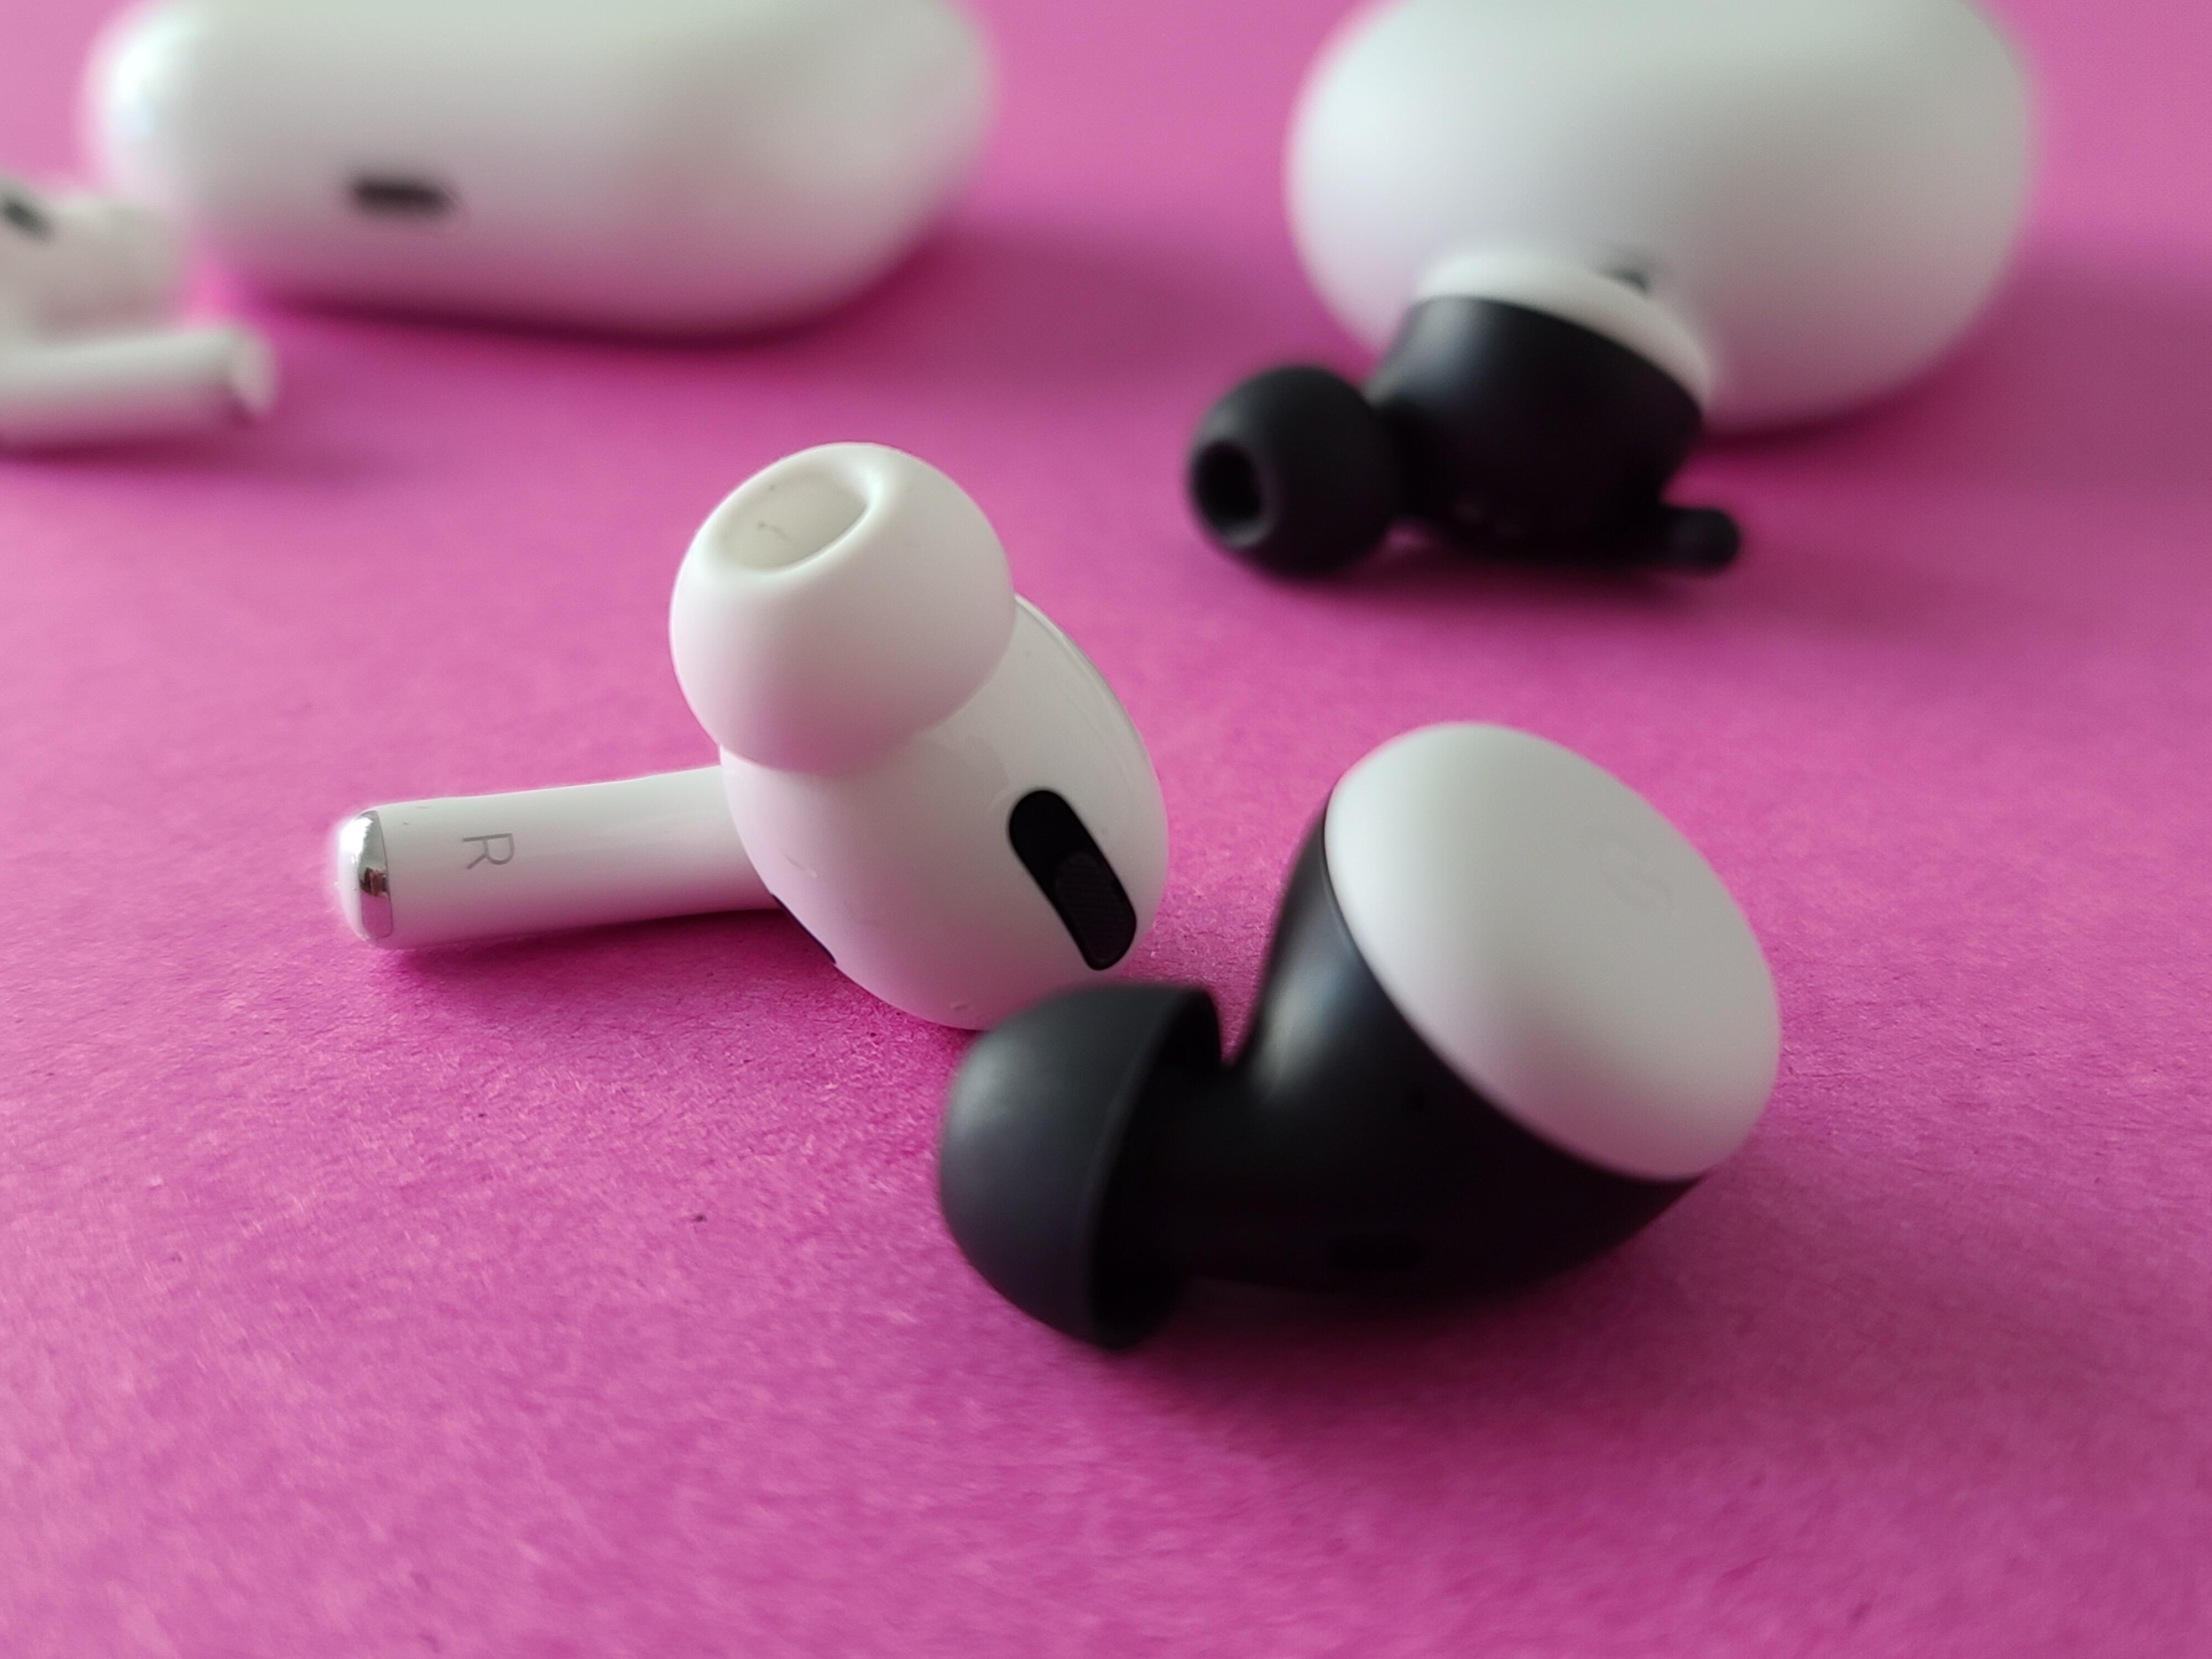 apple-airpods-vs-samsung-buds-plus-9313